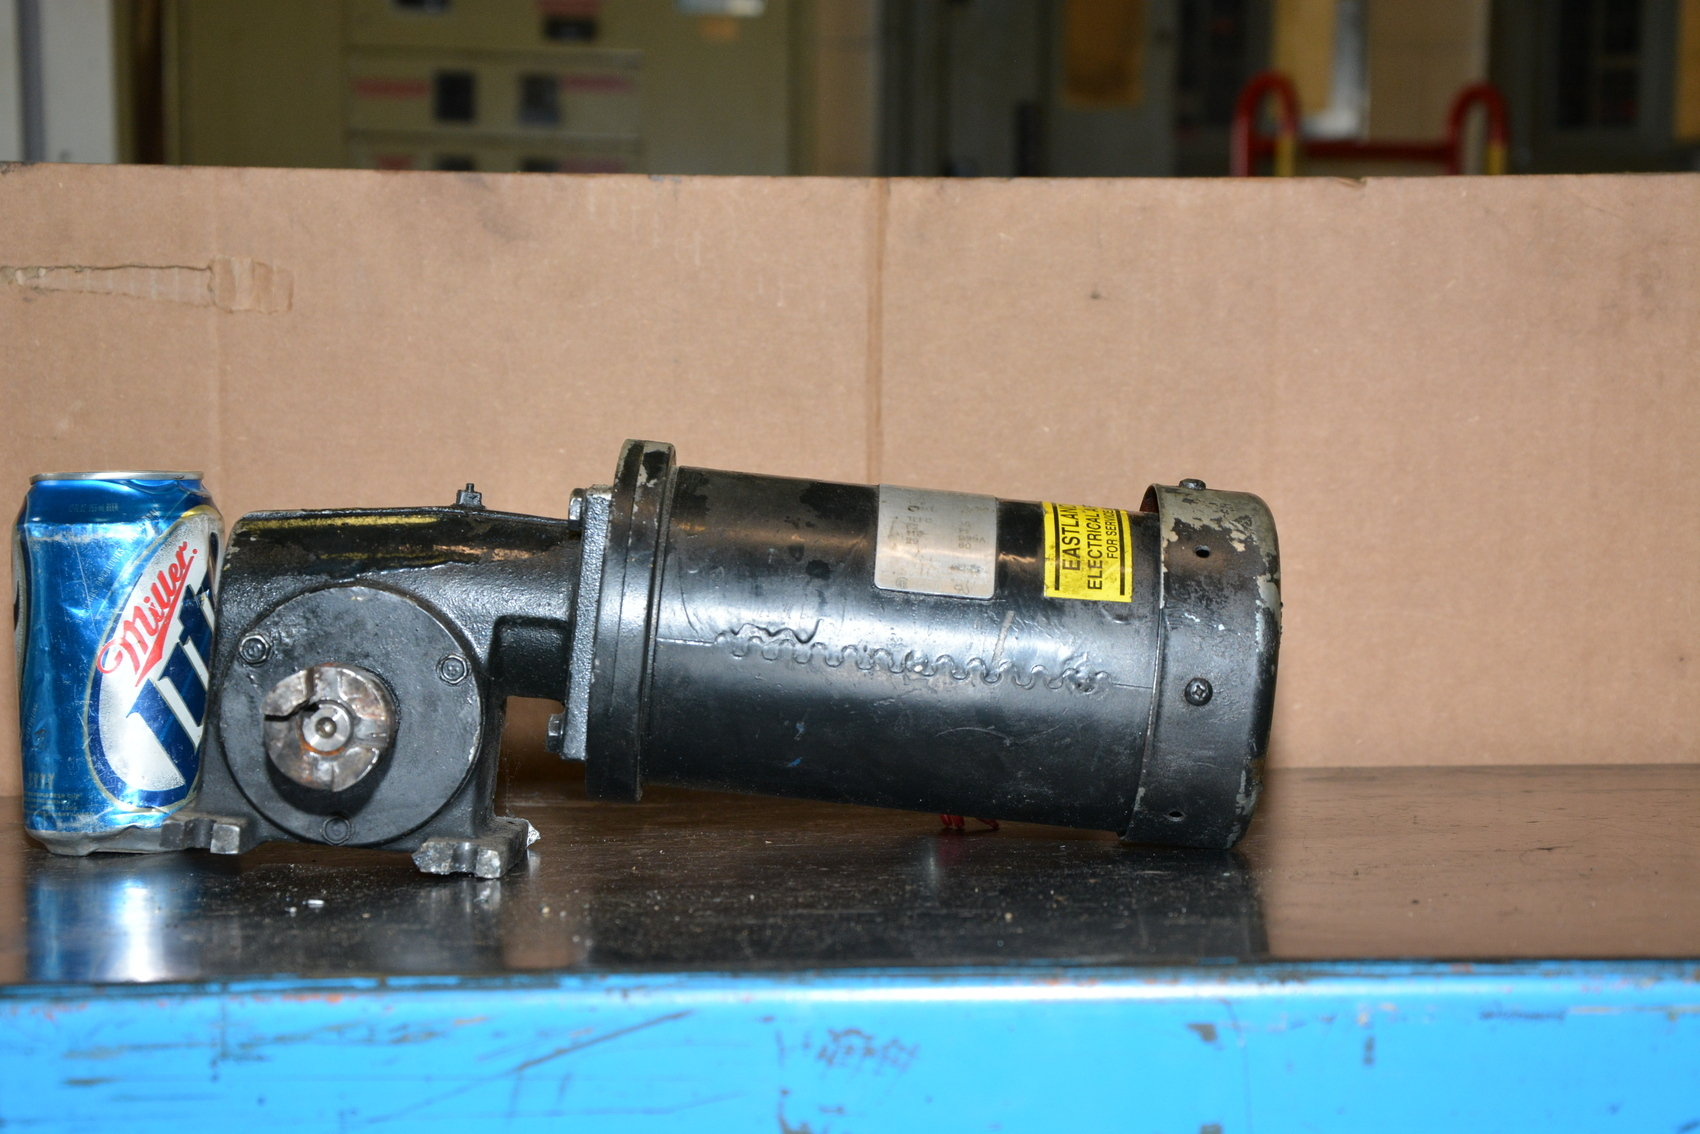 Leeson Cm38p17fz16a 115v Gear Motor 29 Rpm Inv 15654 Ebay